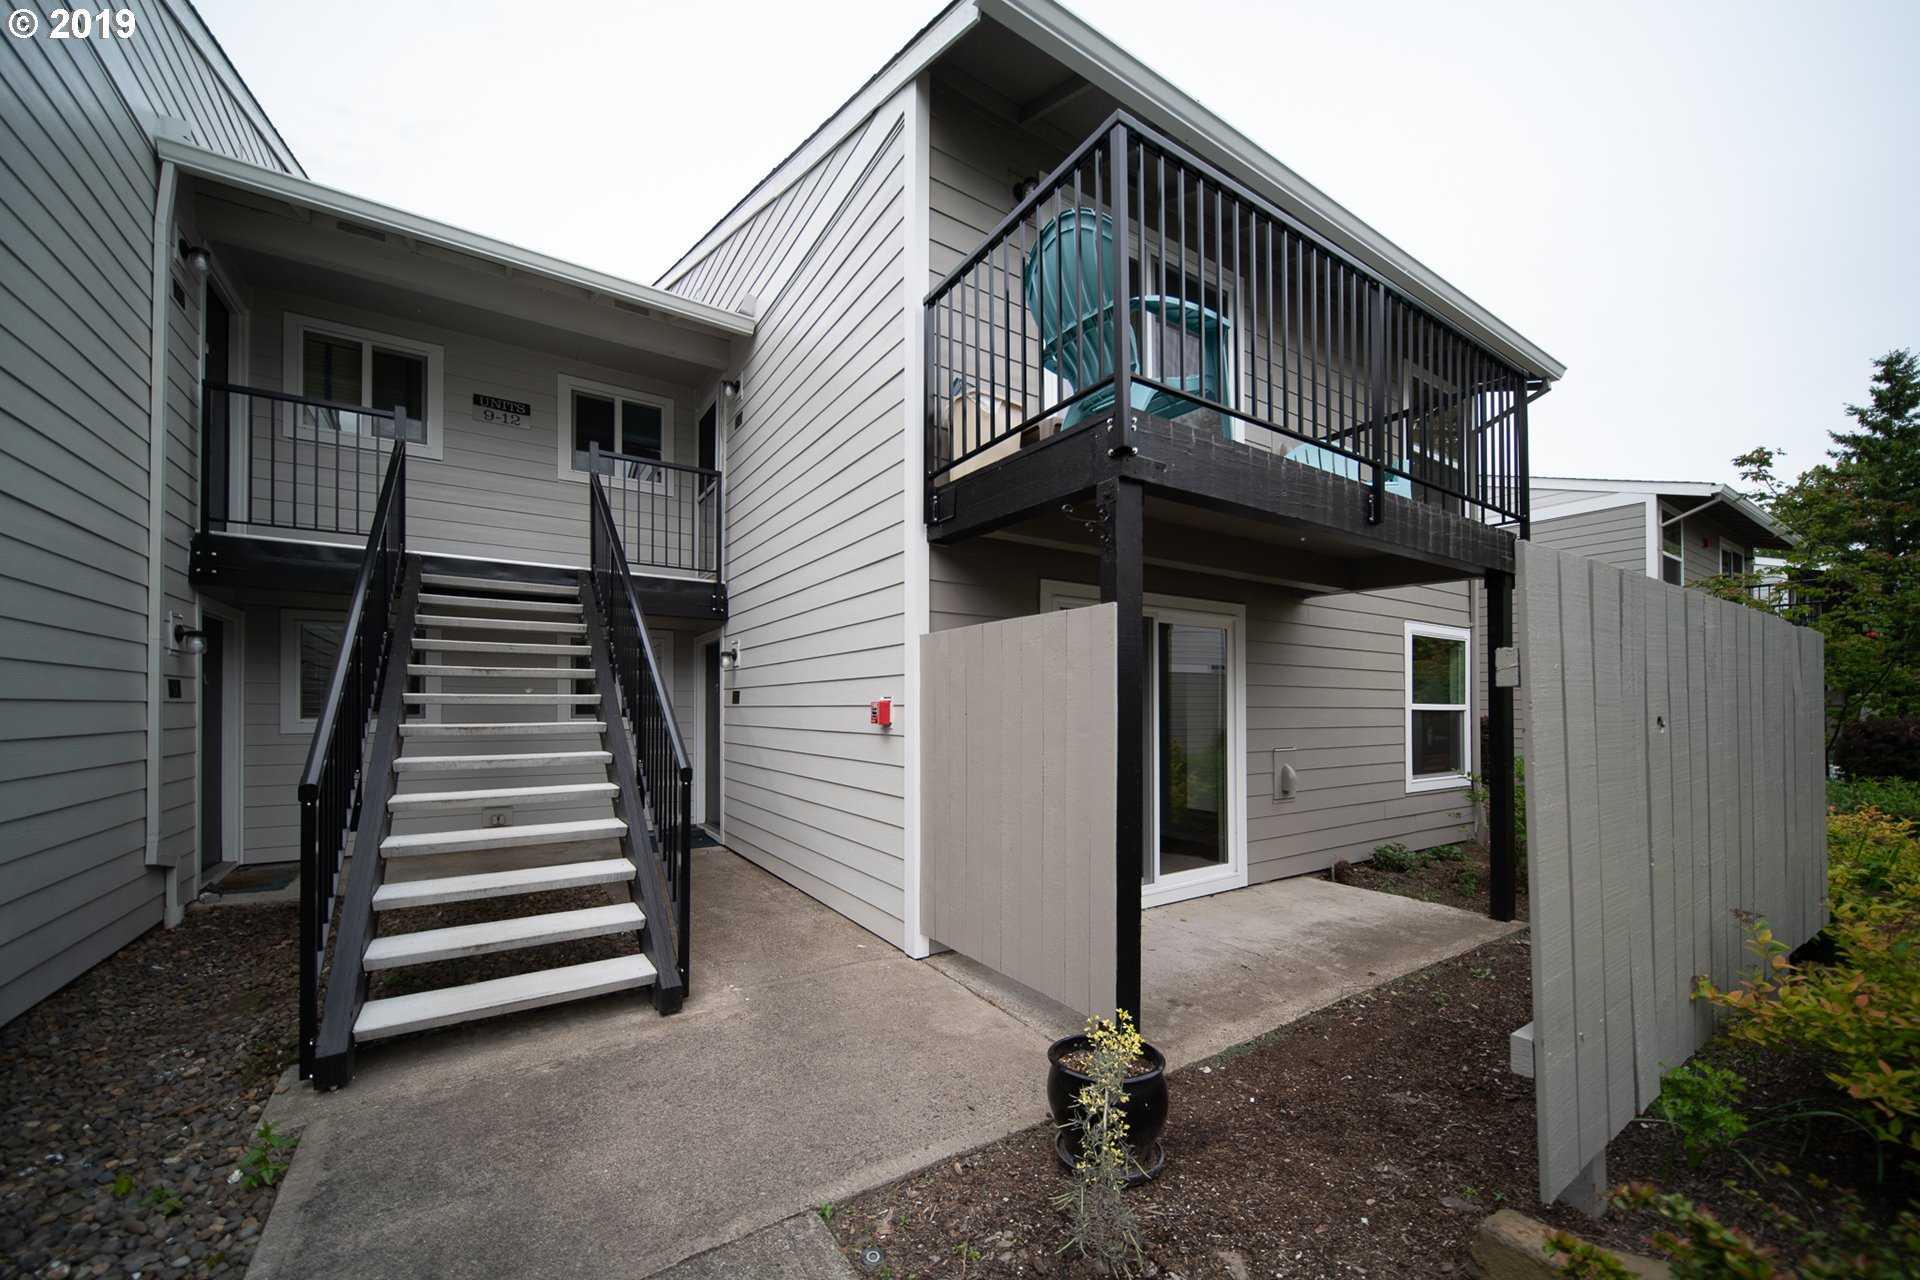 $179,900 - 2Br/1Ba -  for Sale in Sequoia Park Condos, Beaverton